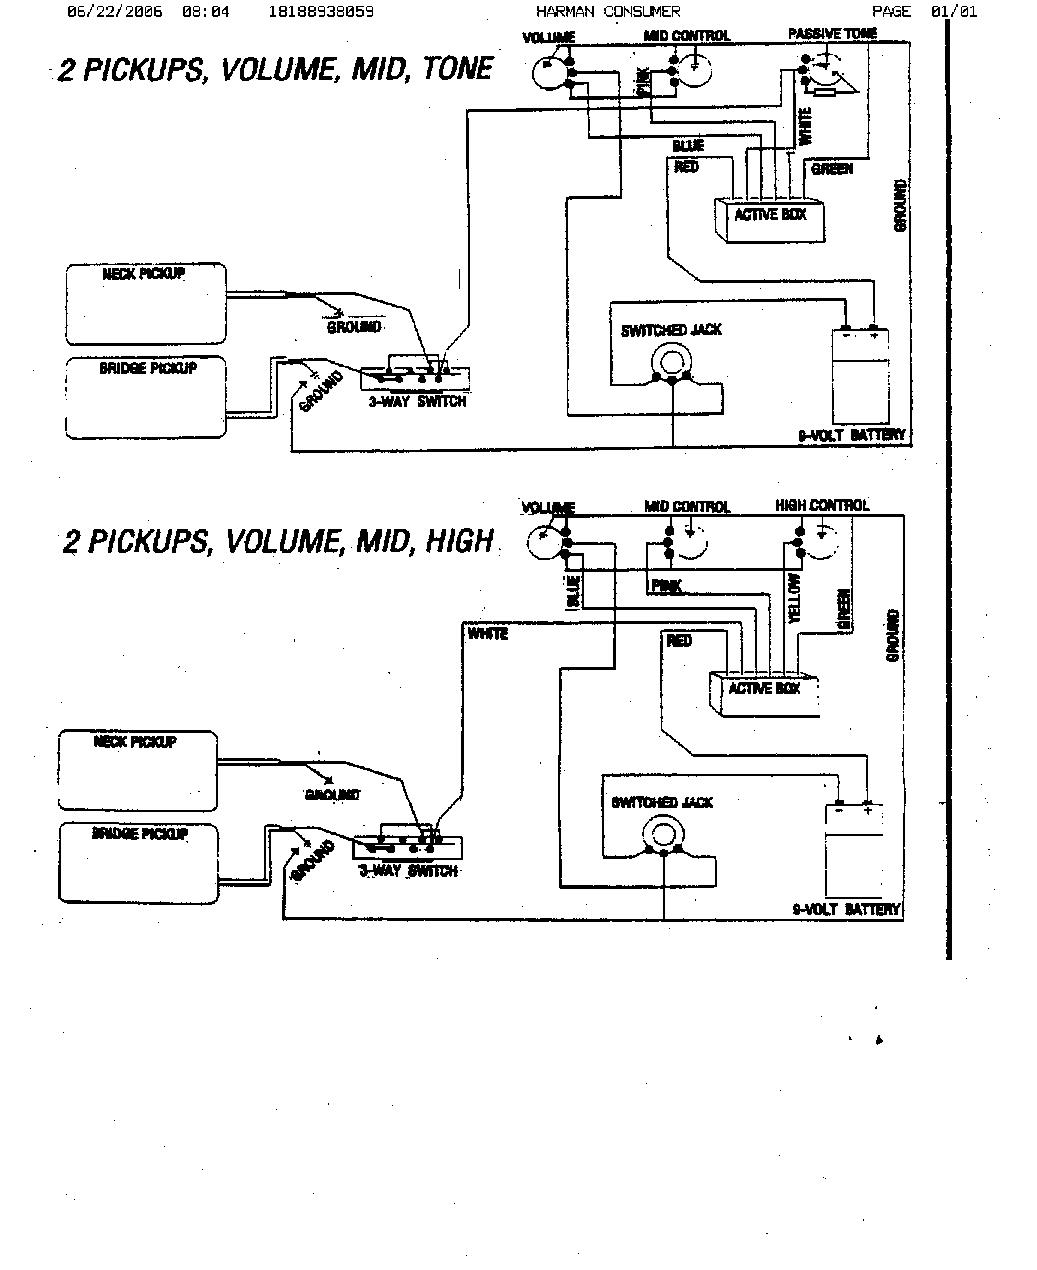 bc rich warlock guitar wiring diagram wiring diagram rh cleanprosperity co Ibanez RG Series Wiring Diagram jackson guitar wiring diagram